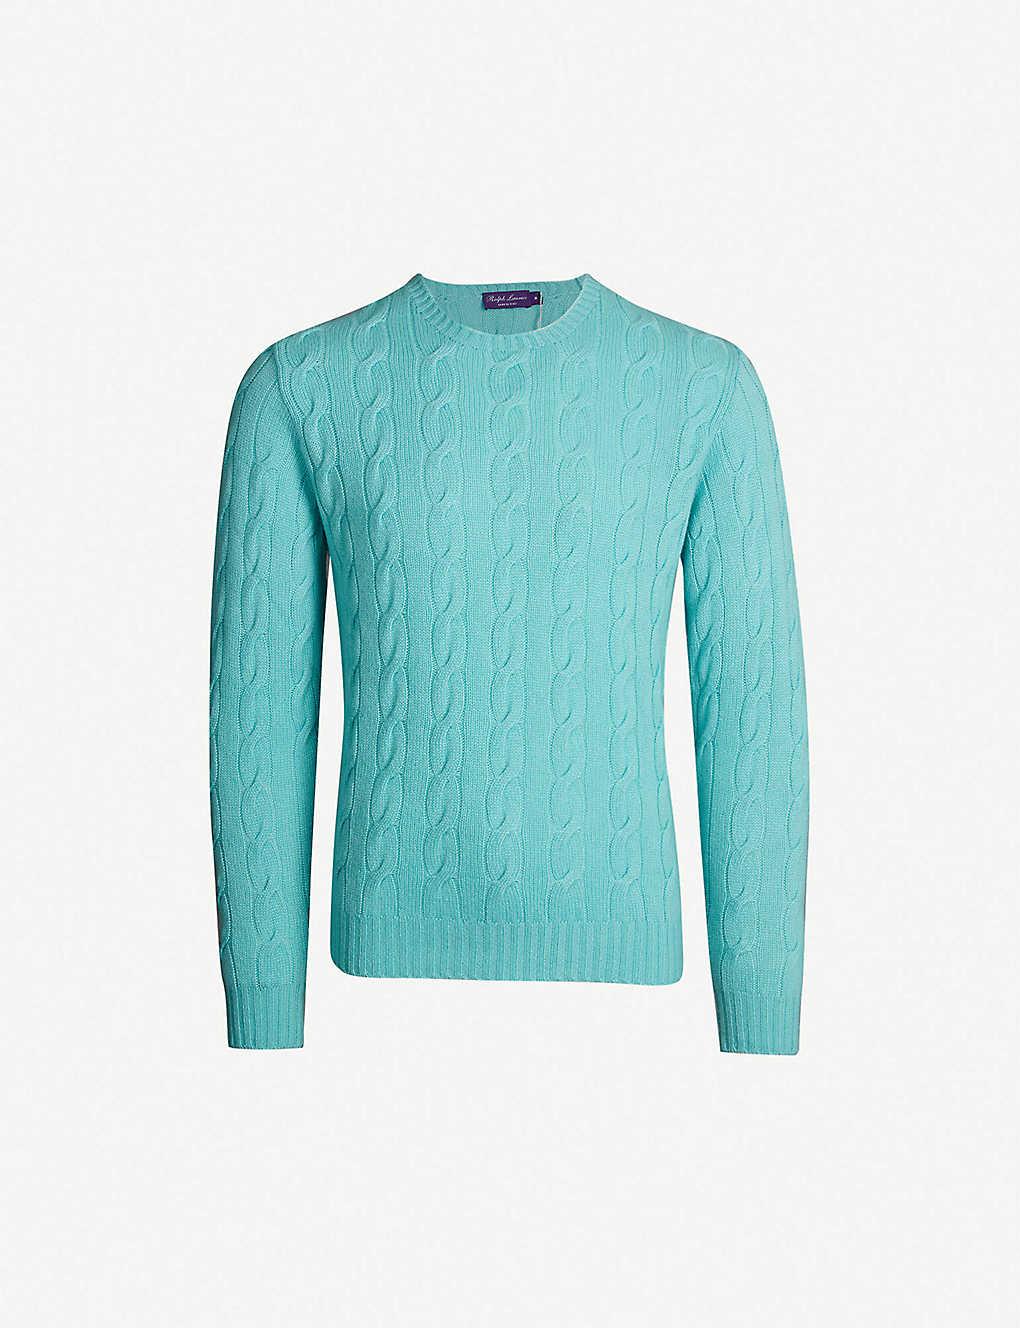 Clothing, Shoes & Accessories Able Brand New Ralph Lauren Pure Cashmere Cable Knit Jumper Purple Size M